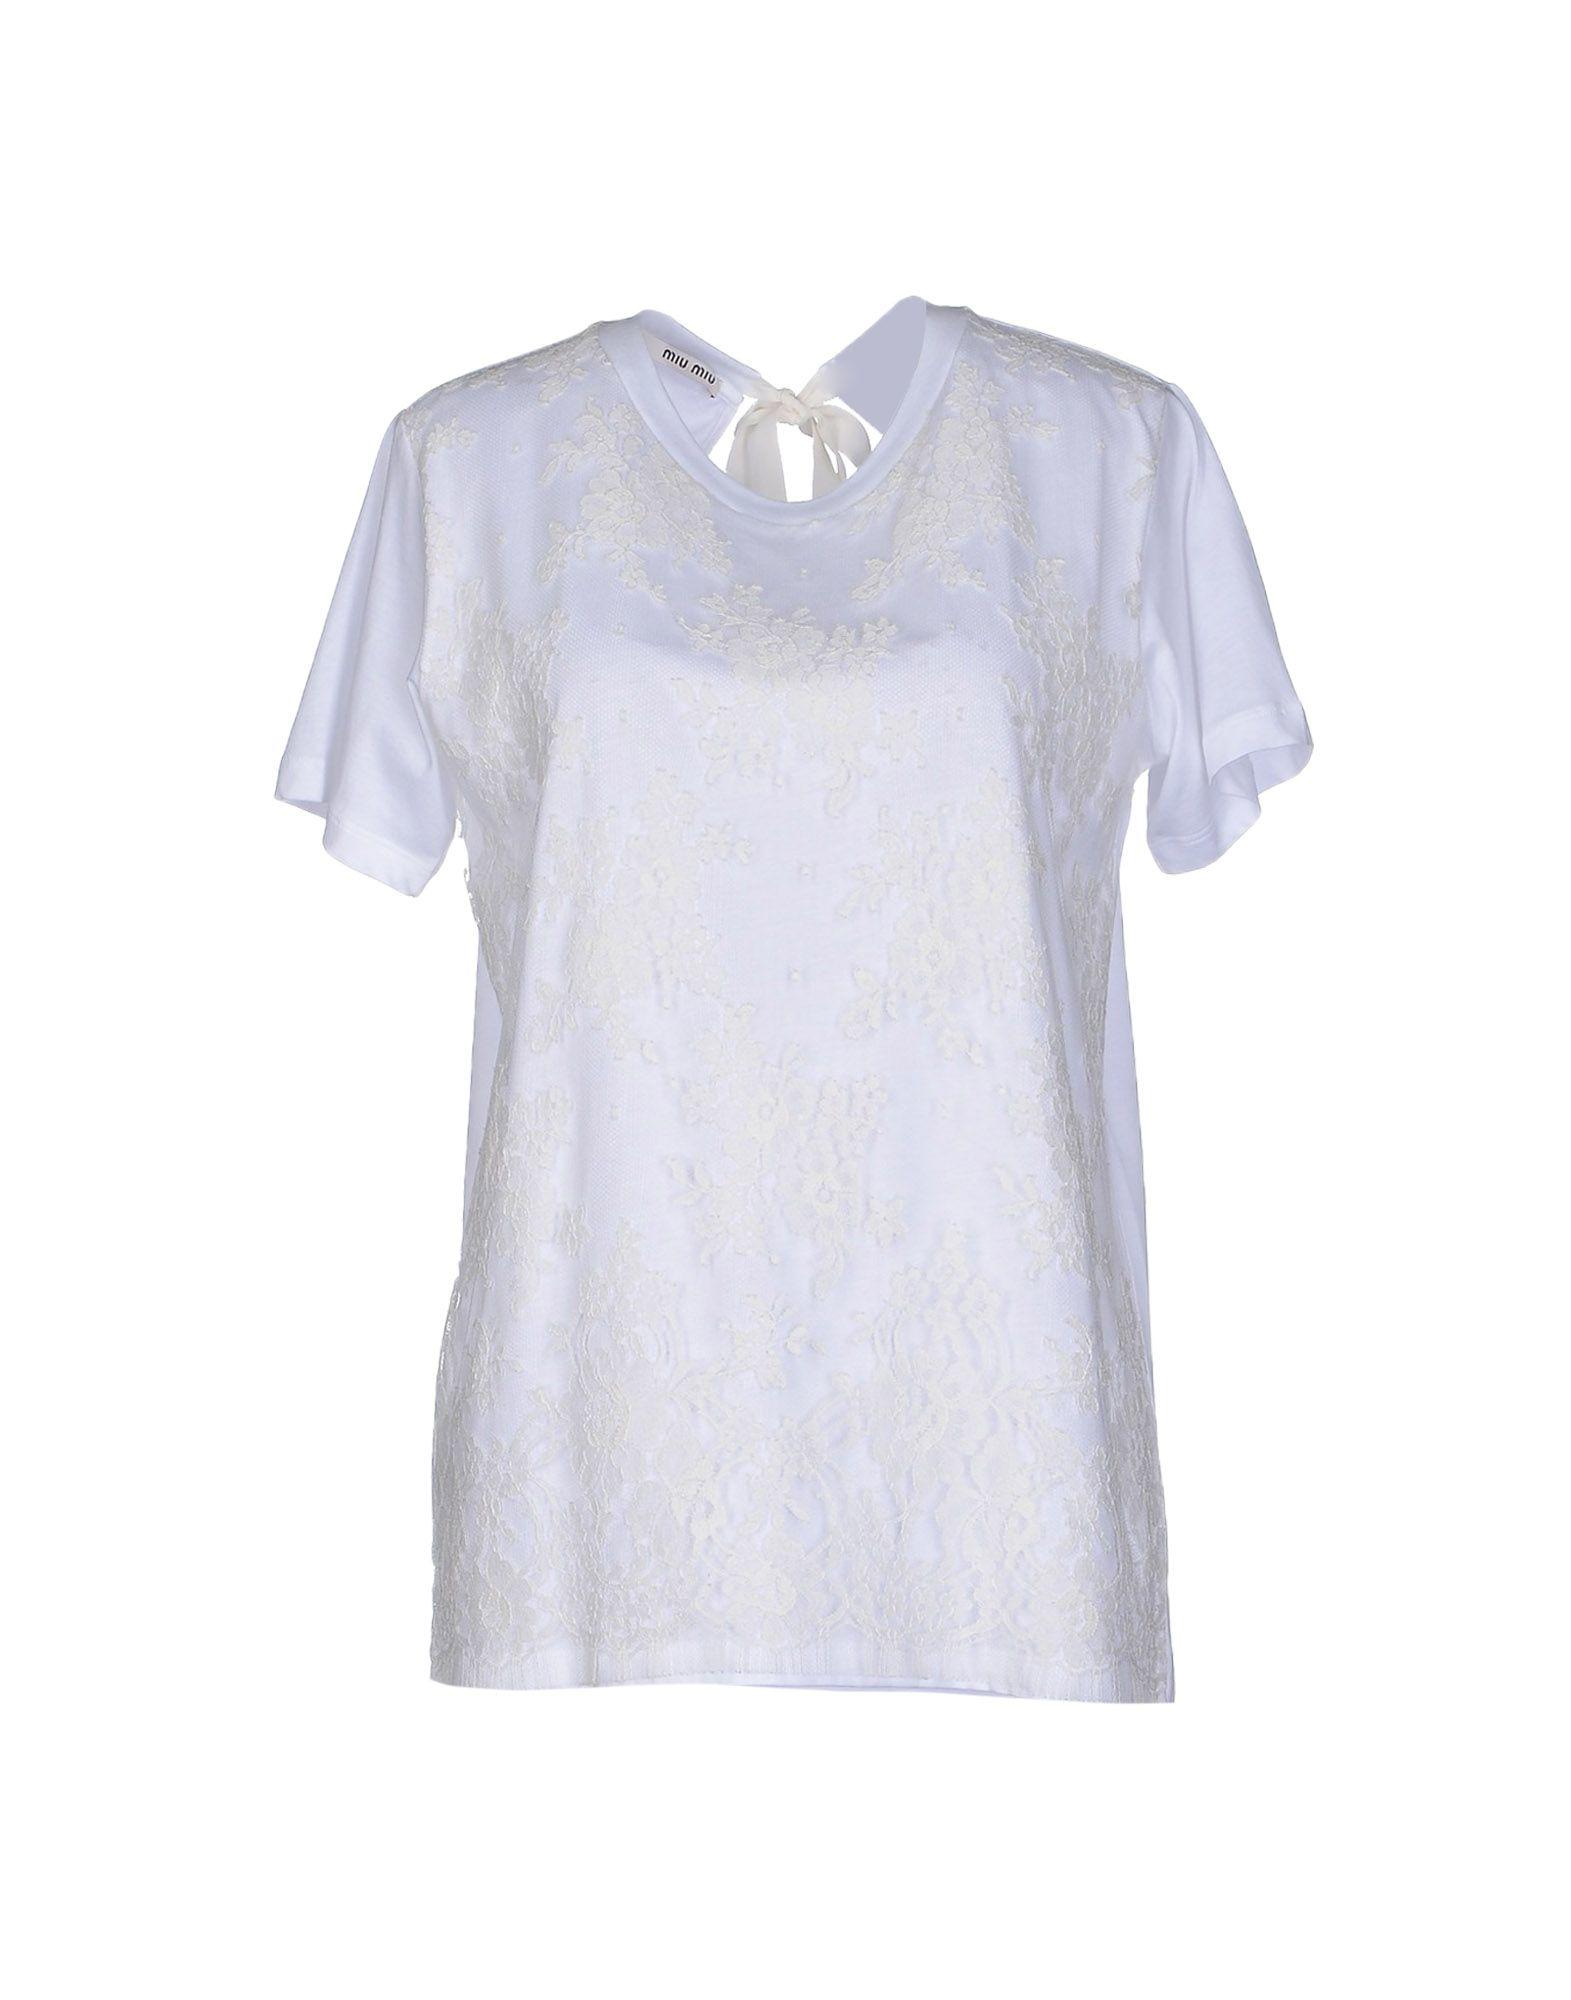 Lyst miu miu t shirt in white for Miu miu t shirt